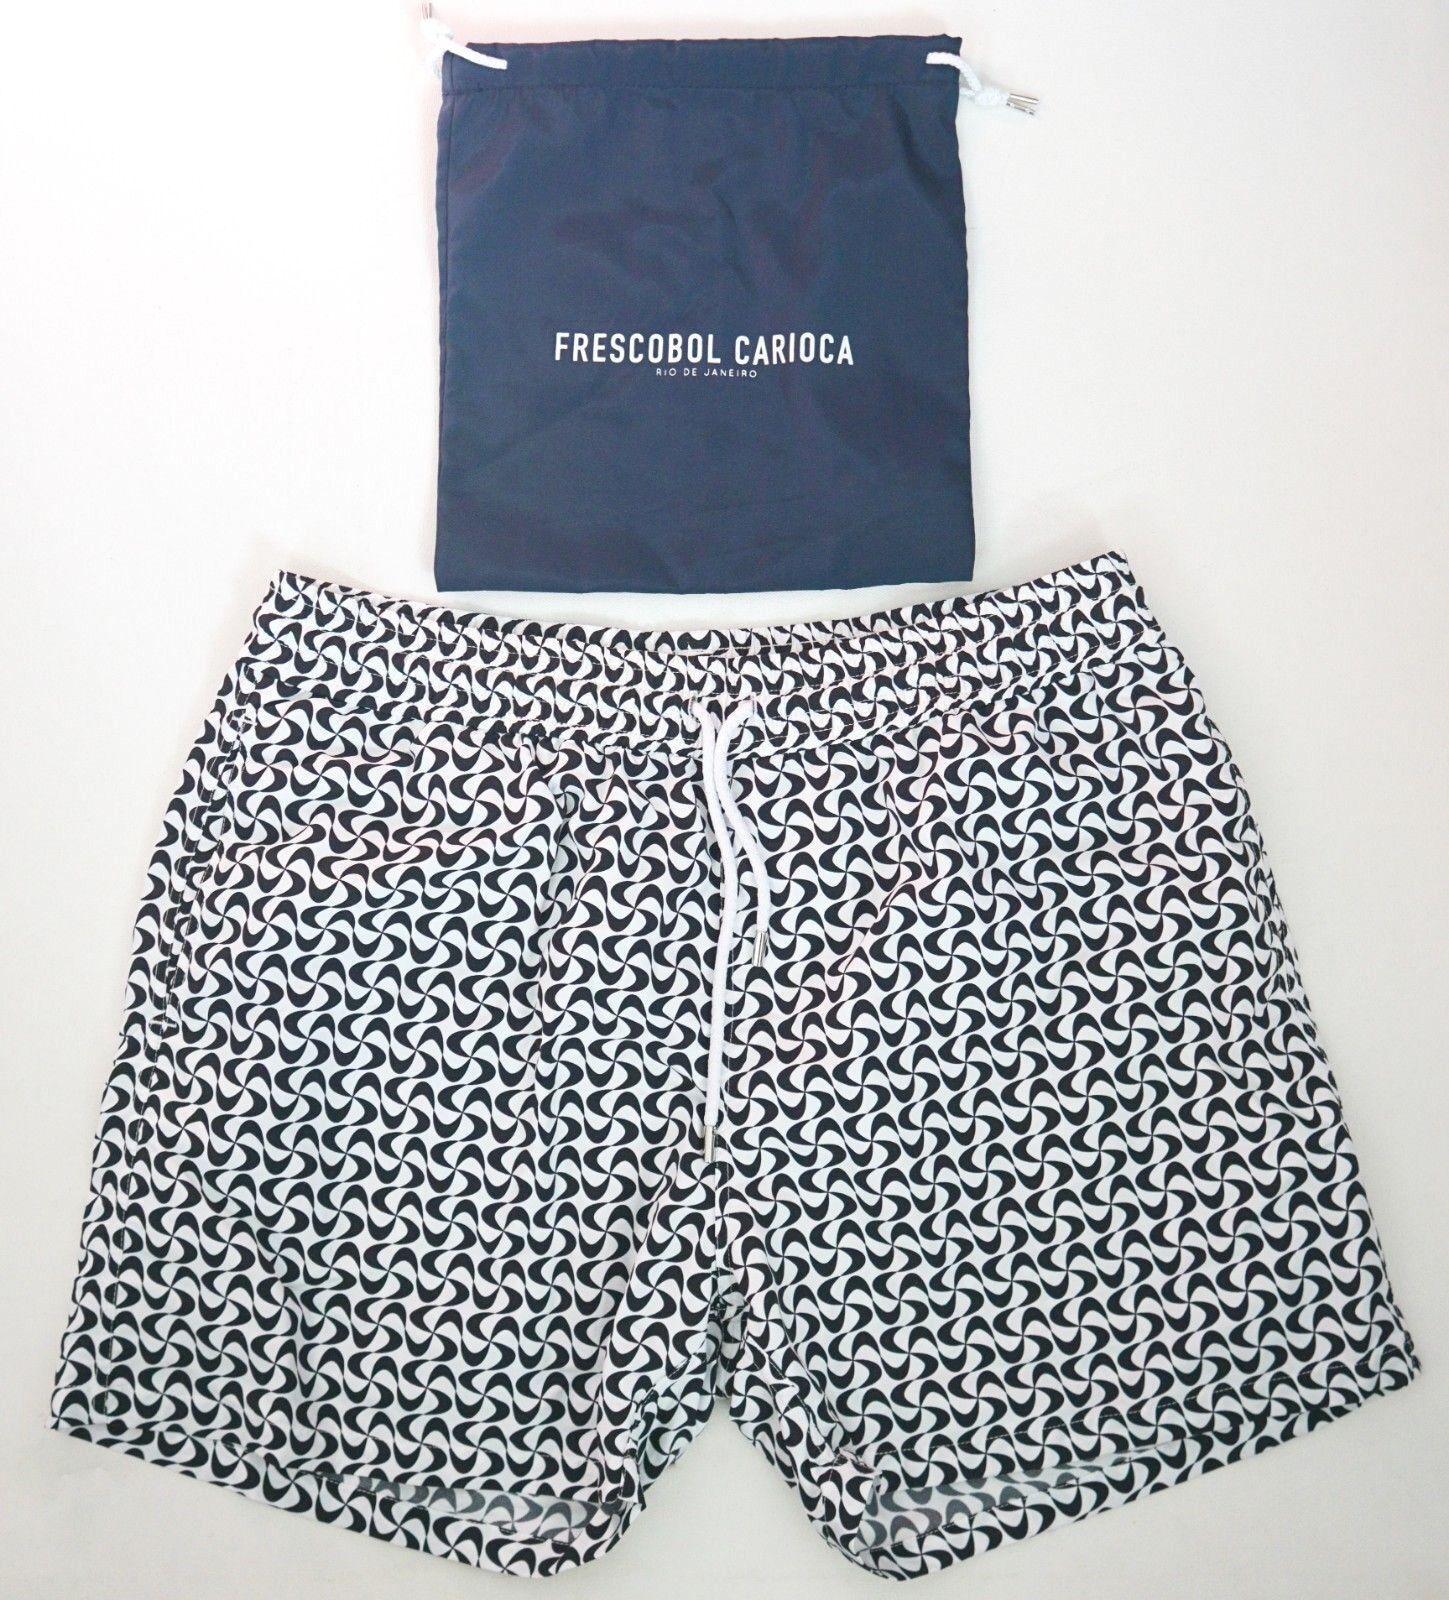 NWT Authentic FRESCOBOL CARIOCA Swim Shorts Trunks Beachwear XXXL 3XL